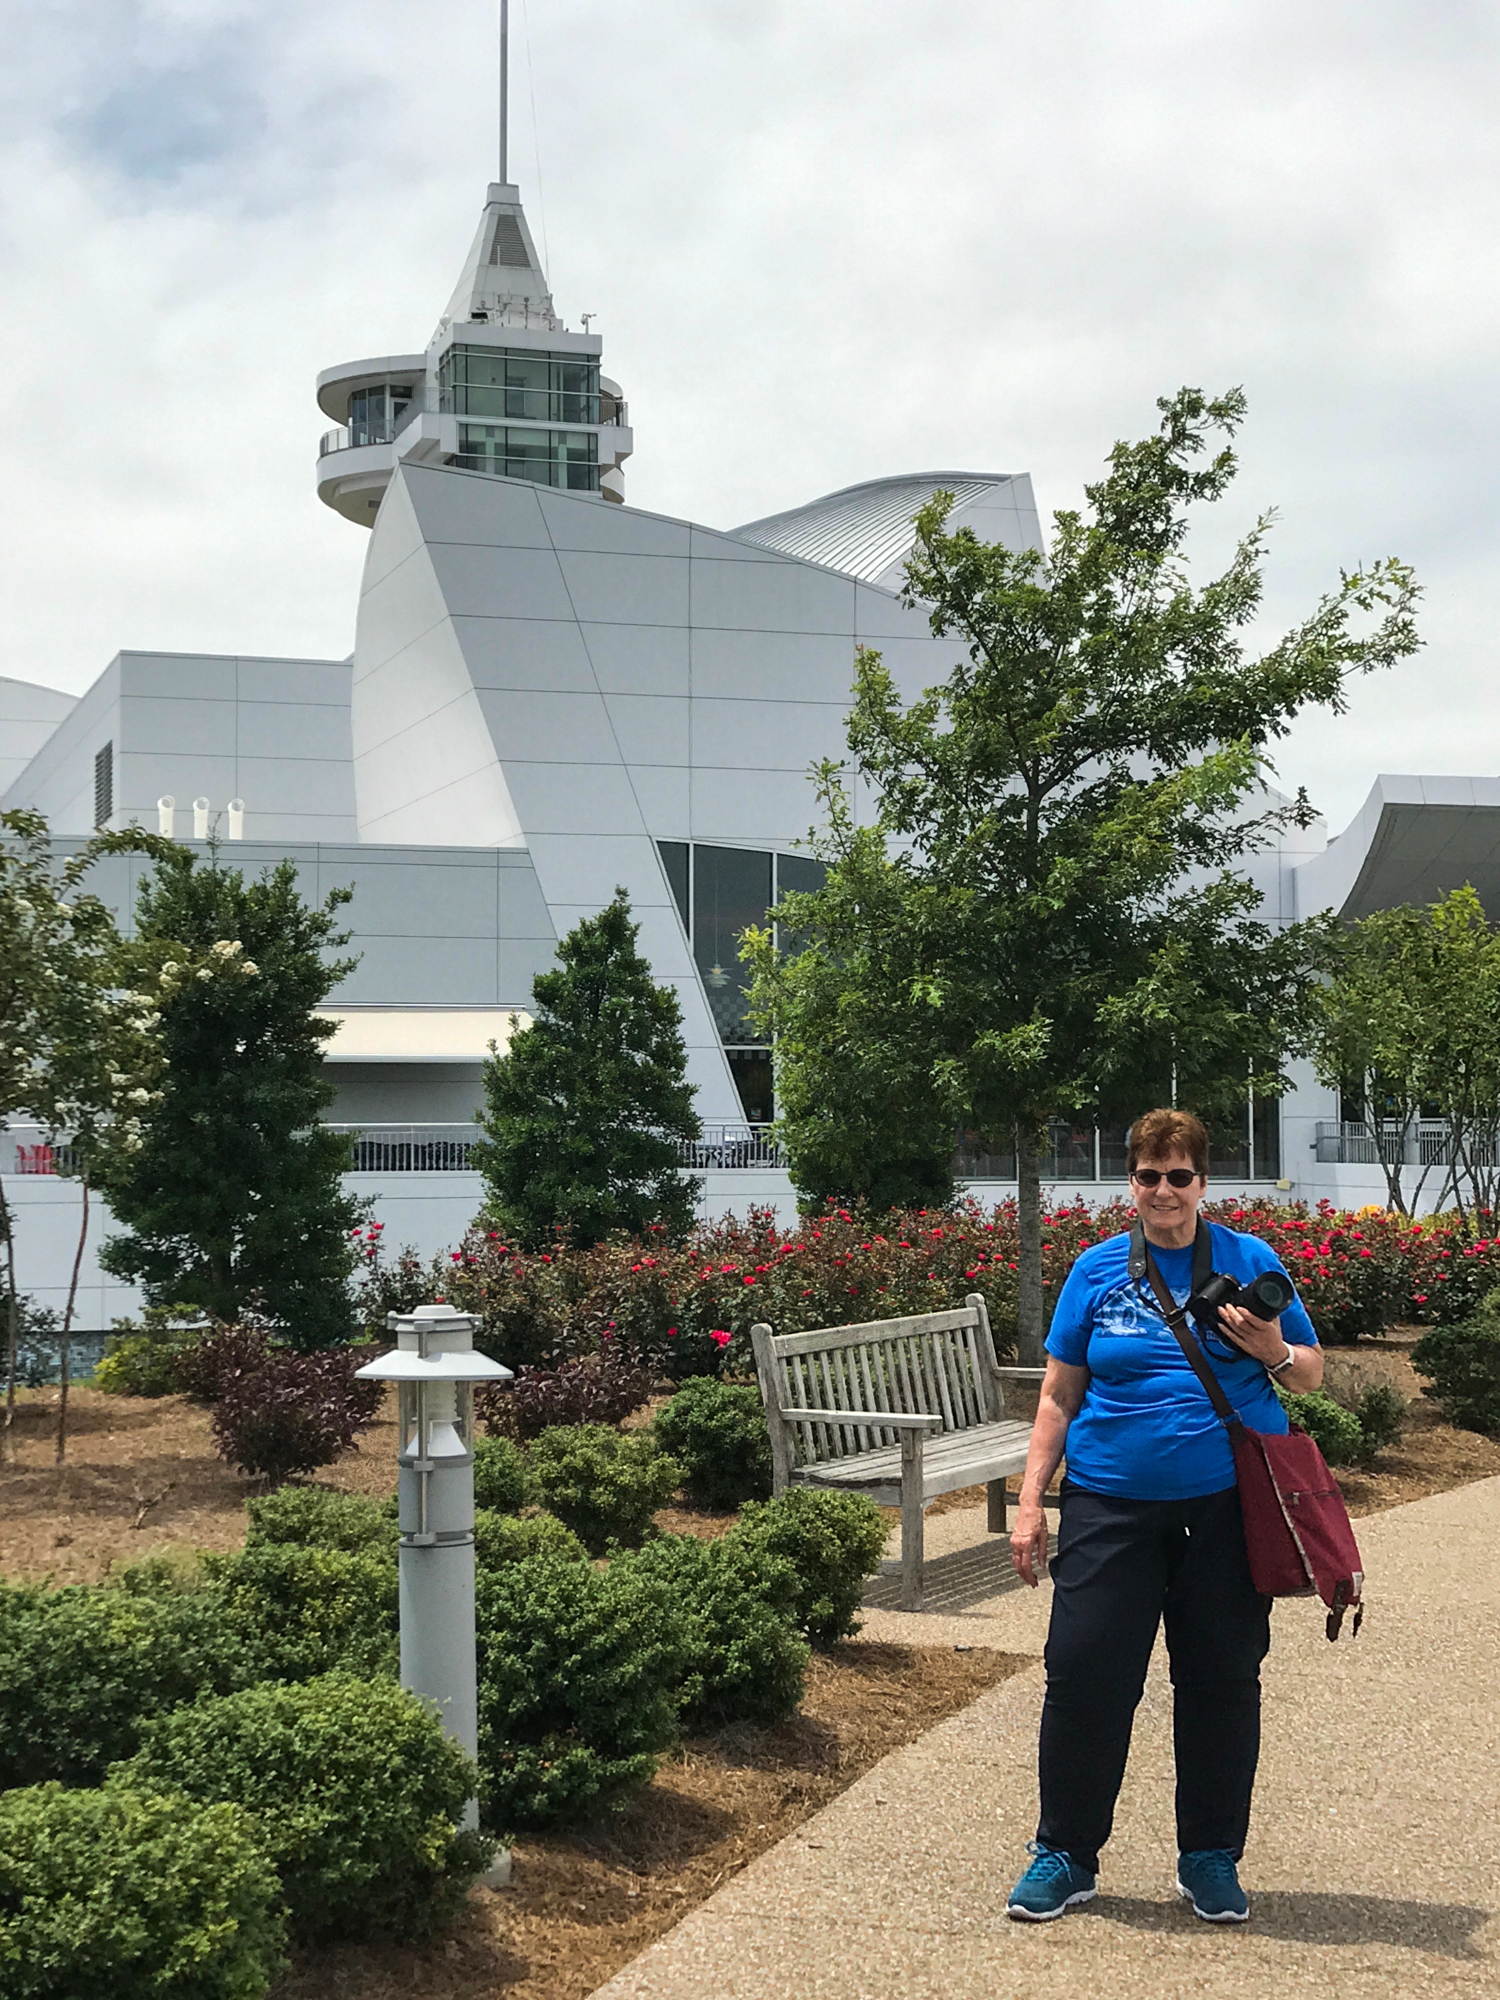 Discovery Park of America KY